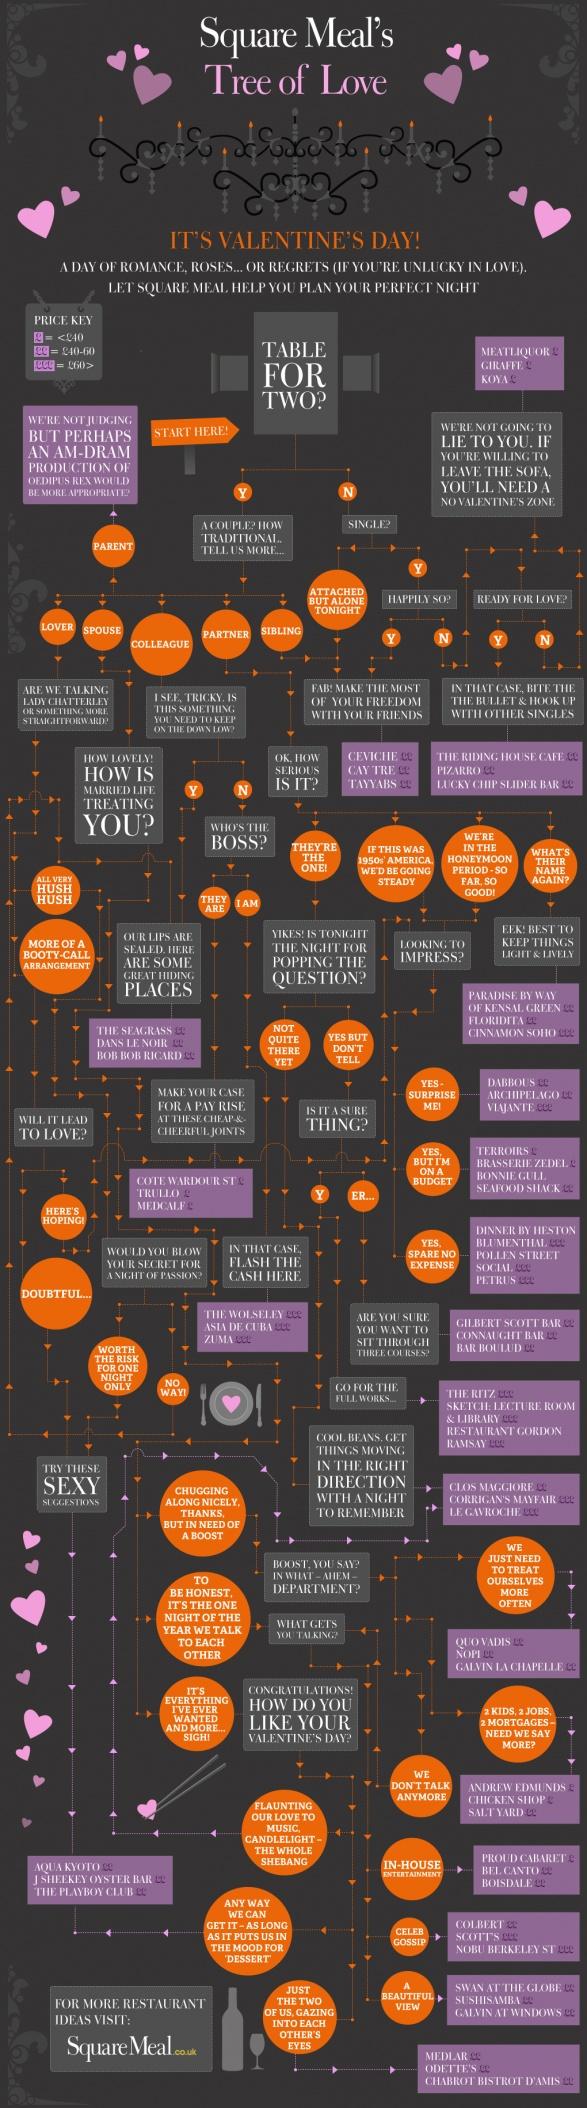 best 25 decision tree ideas on pinterest kaplan